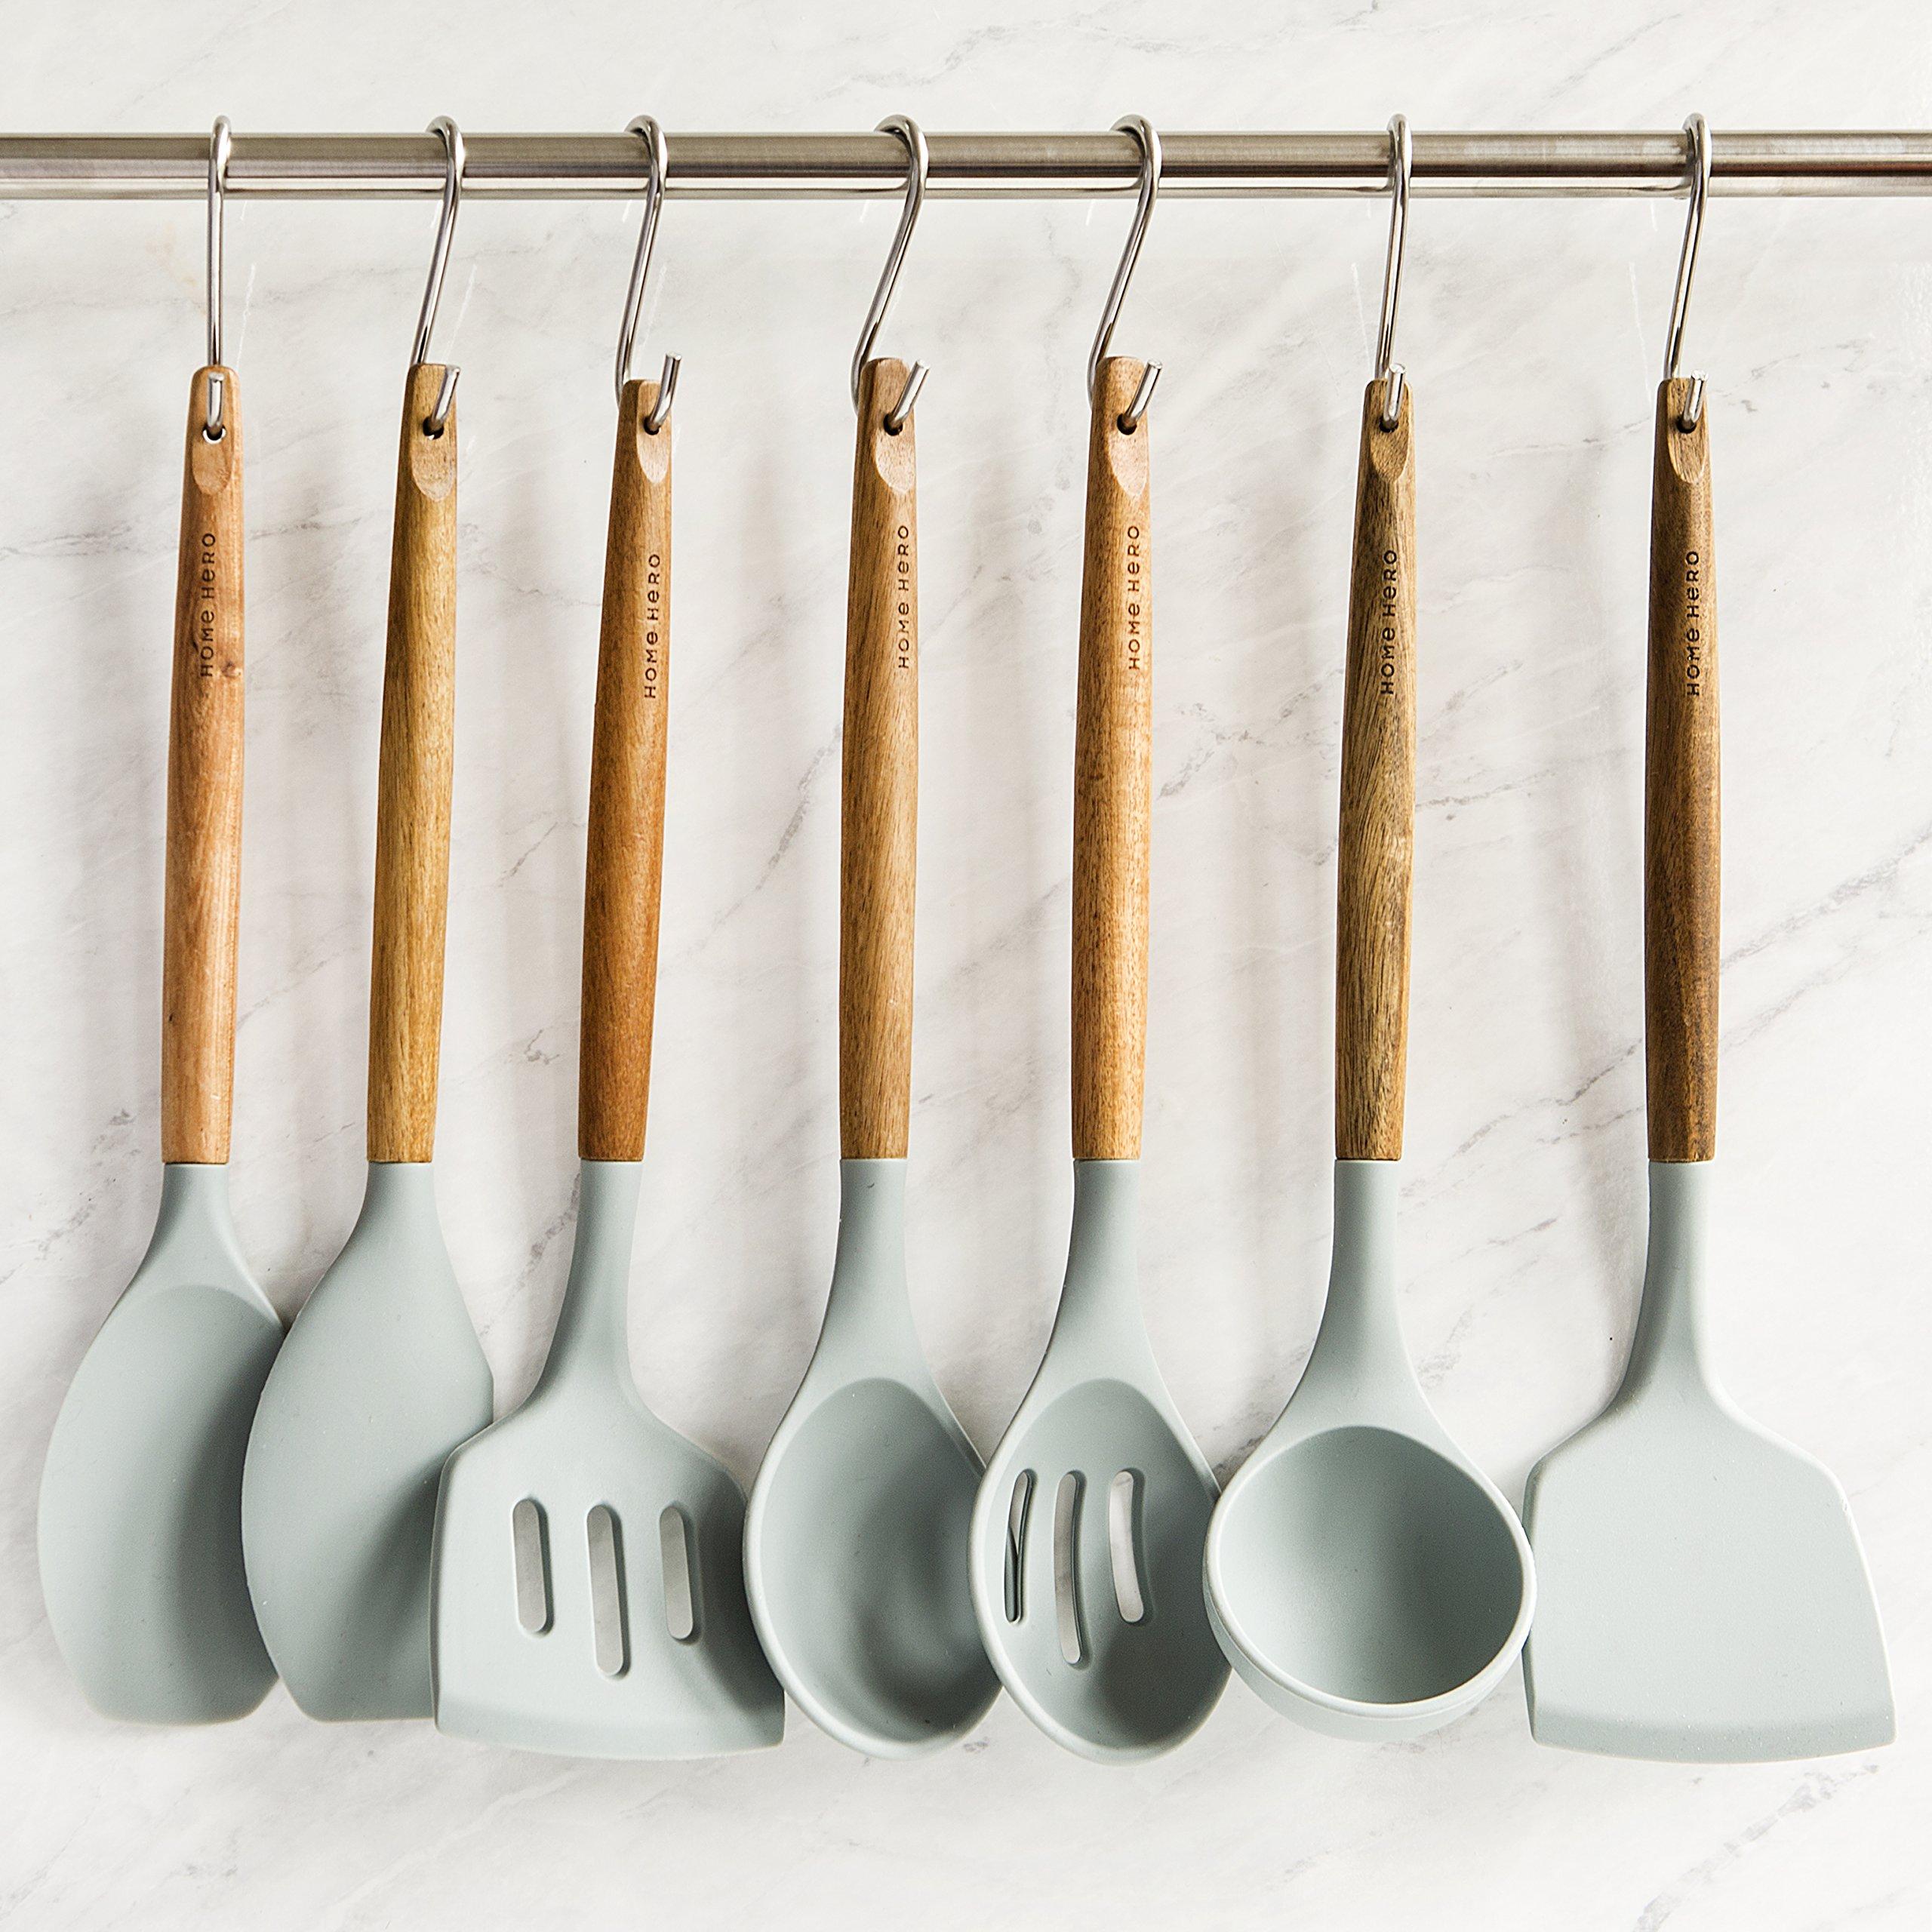 Silicone Cooking Utensils Kitchen Utensil set - 8 Natural Acacia Wooden Silicone Kitchen Utensils Set - Silicone Utensil Set Spatula Set - Silicone Utensils Cooking Utensil Set - Kitchen Tools Gadgets by HomeHero (Image #6)